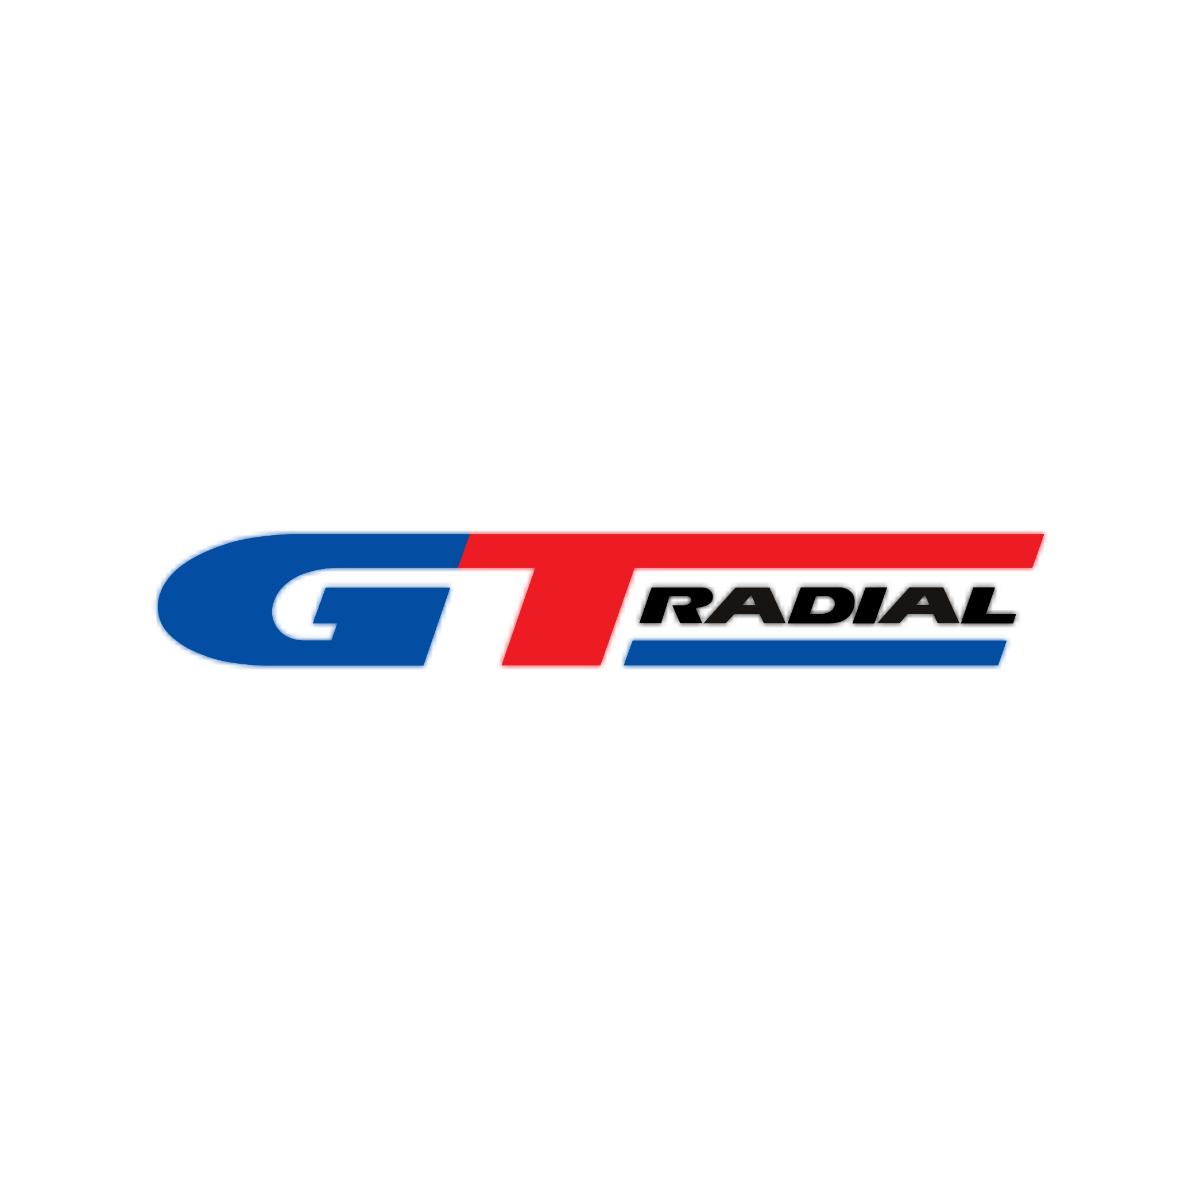 GT Radial Tires Merrick Tire Center Queens, NY